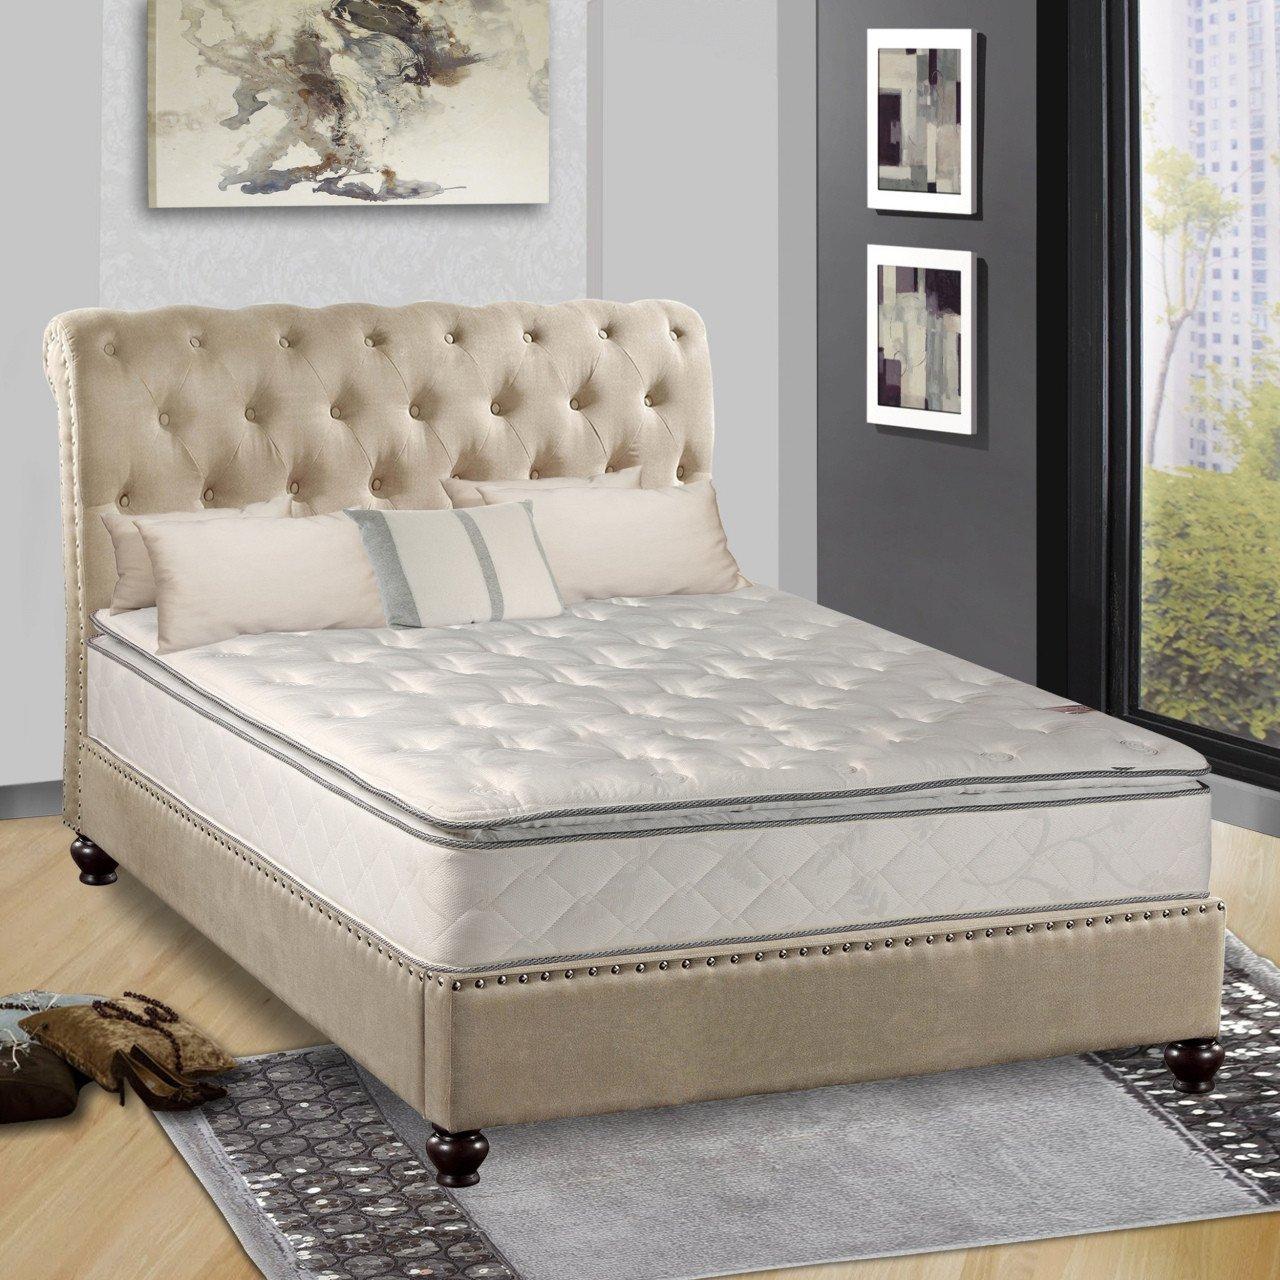 Big Lots Bedroom Furniture Luxury Big Lots Bedroom Sets — Procura Home Blog